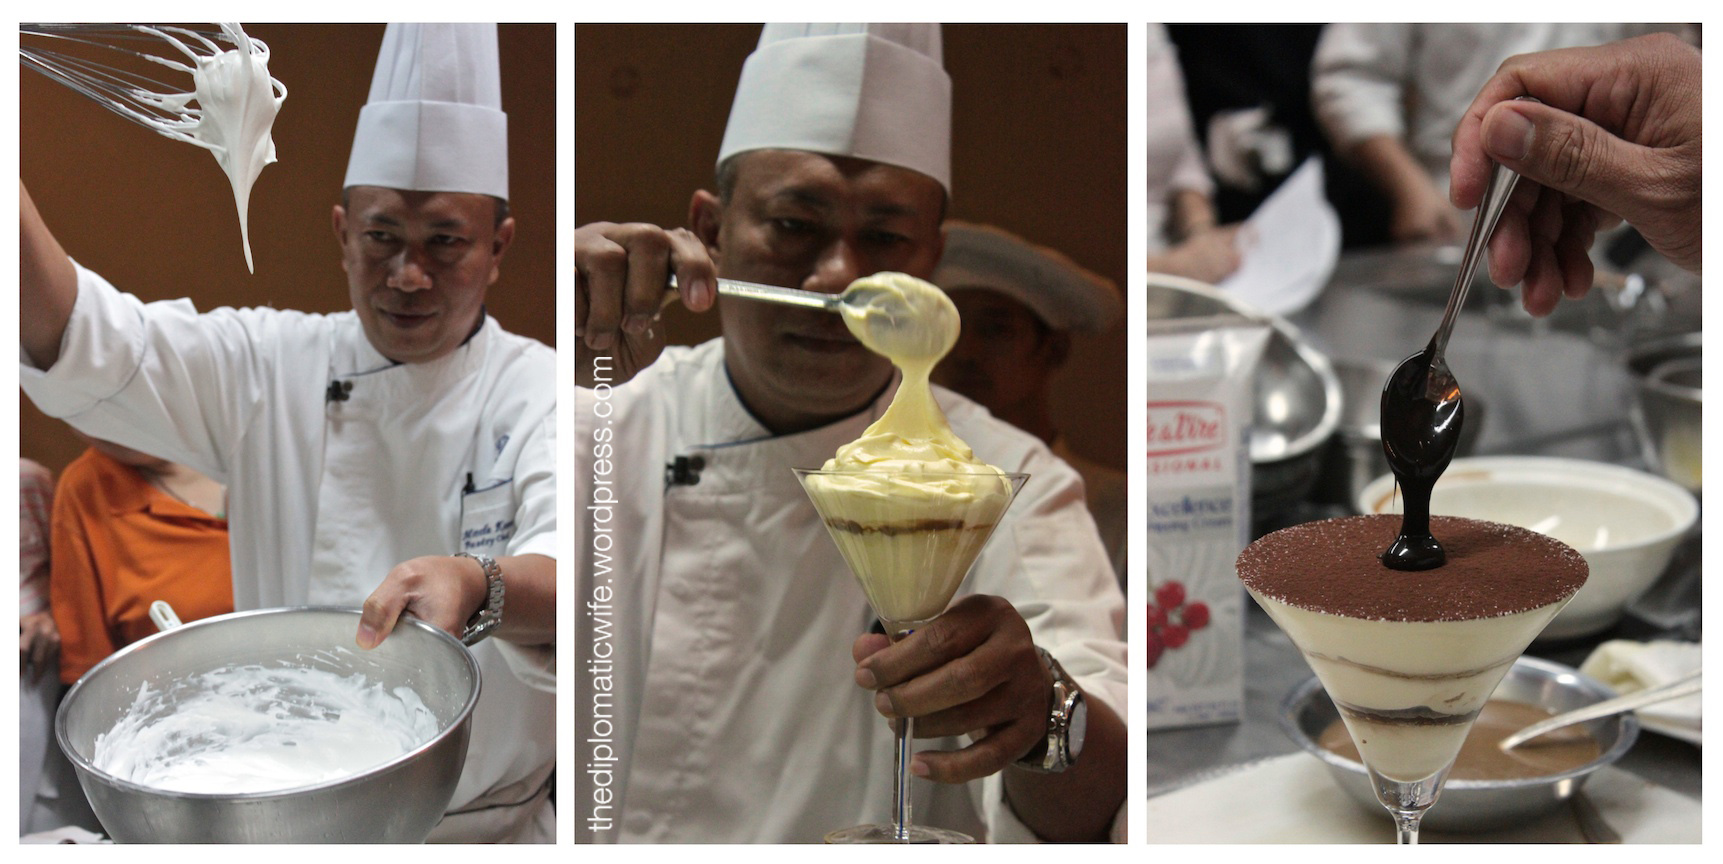 Creamy Baileys Tiramisu at the Ritz Carlton Italian vs Pastry Cooking Class